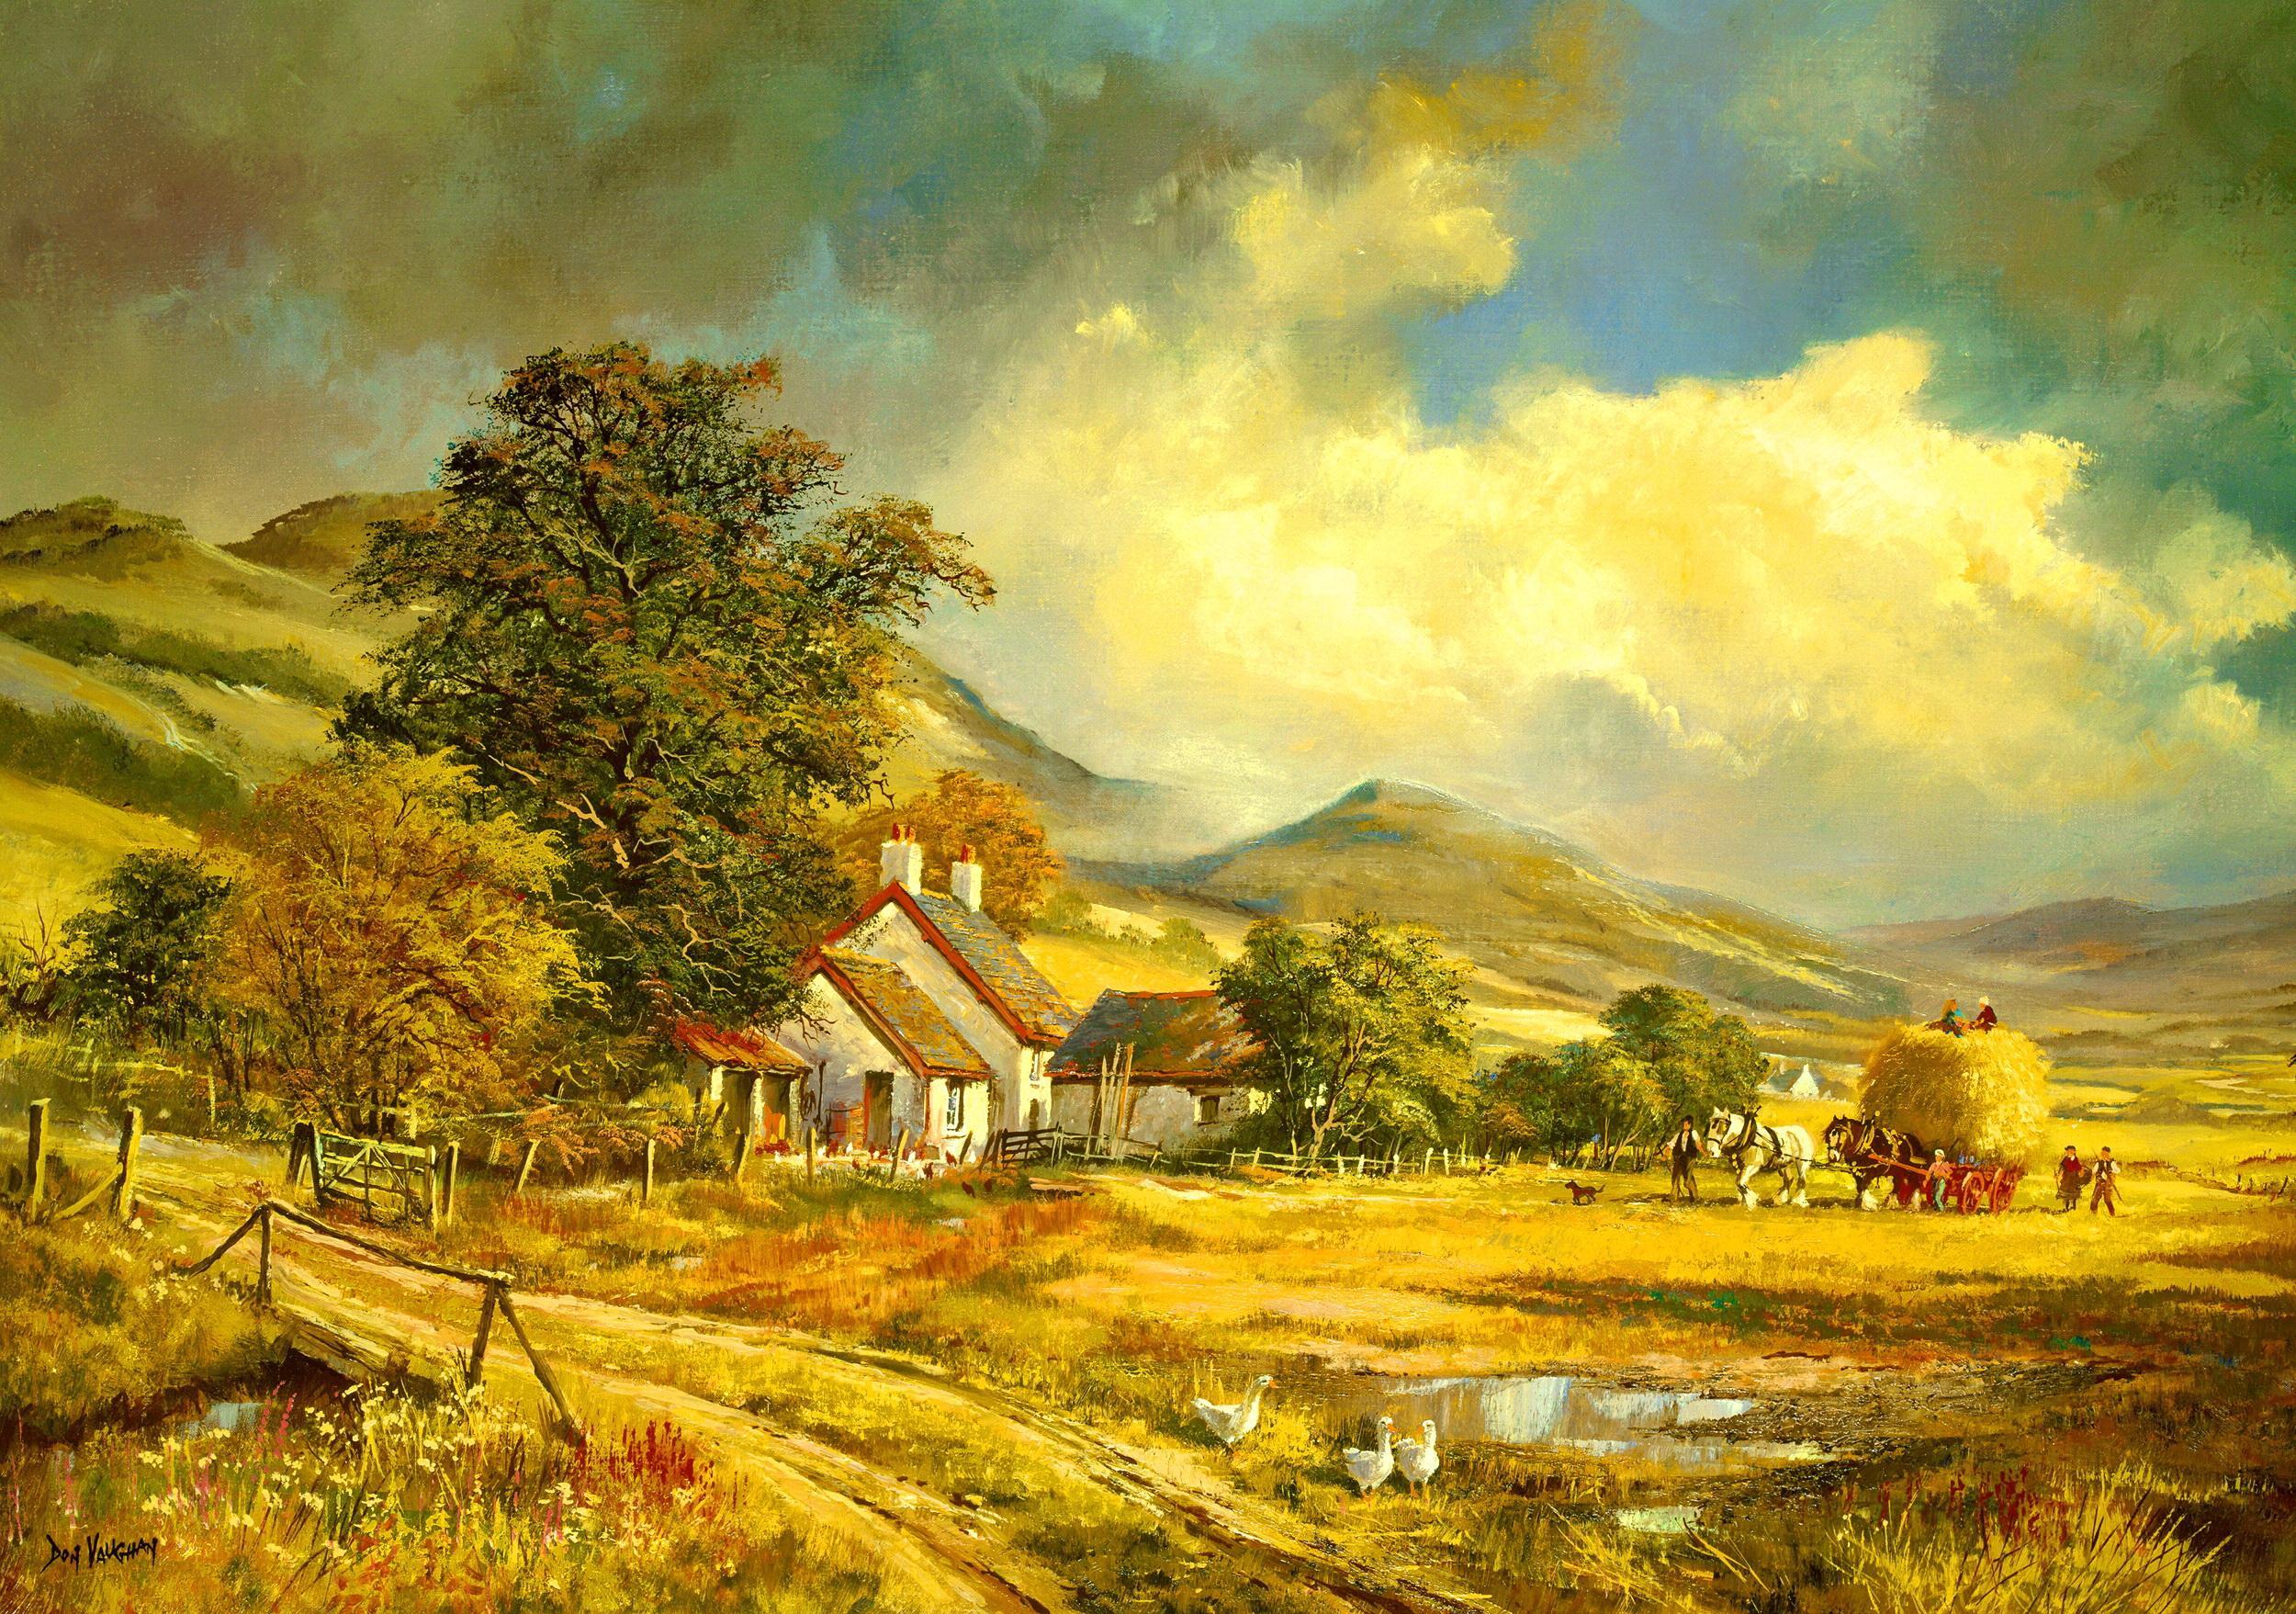 Wallpaper Farmhouse 2500x1757